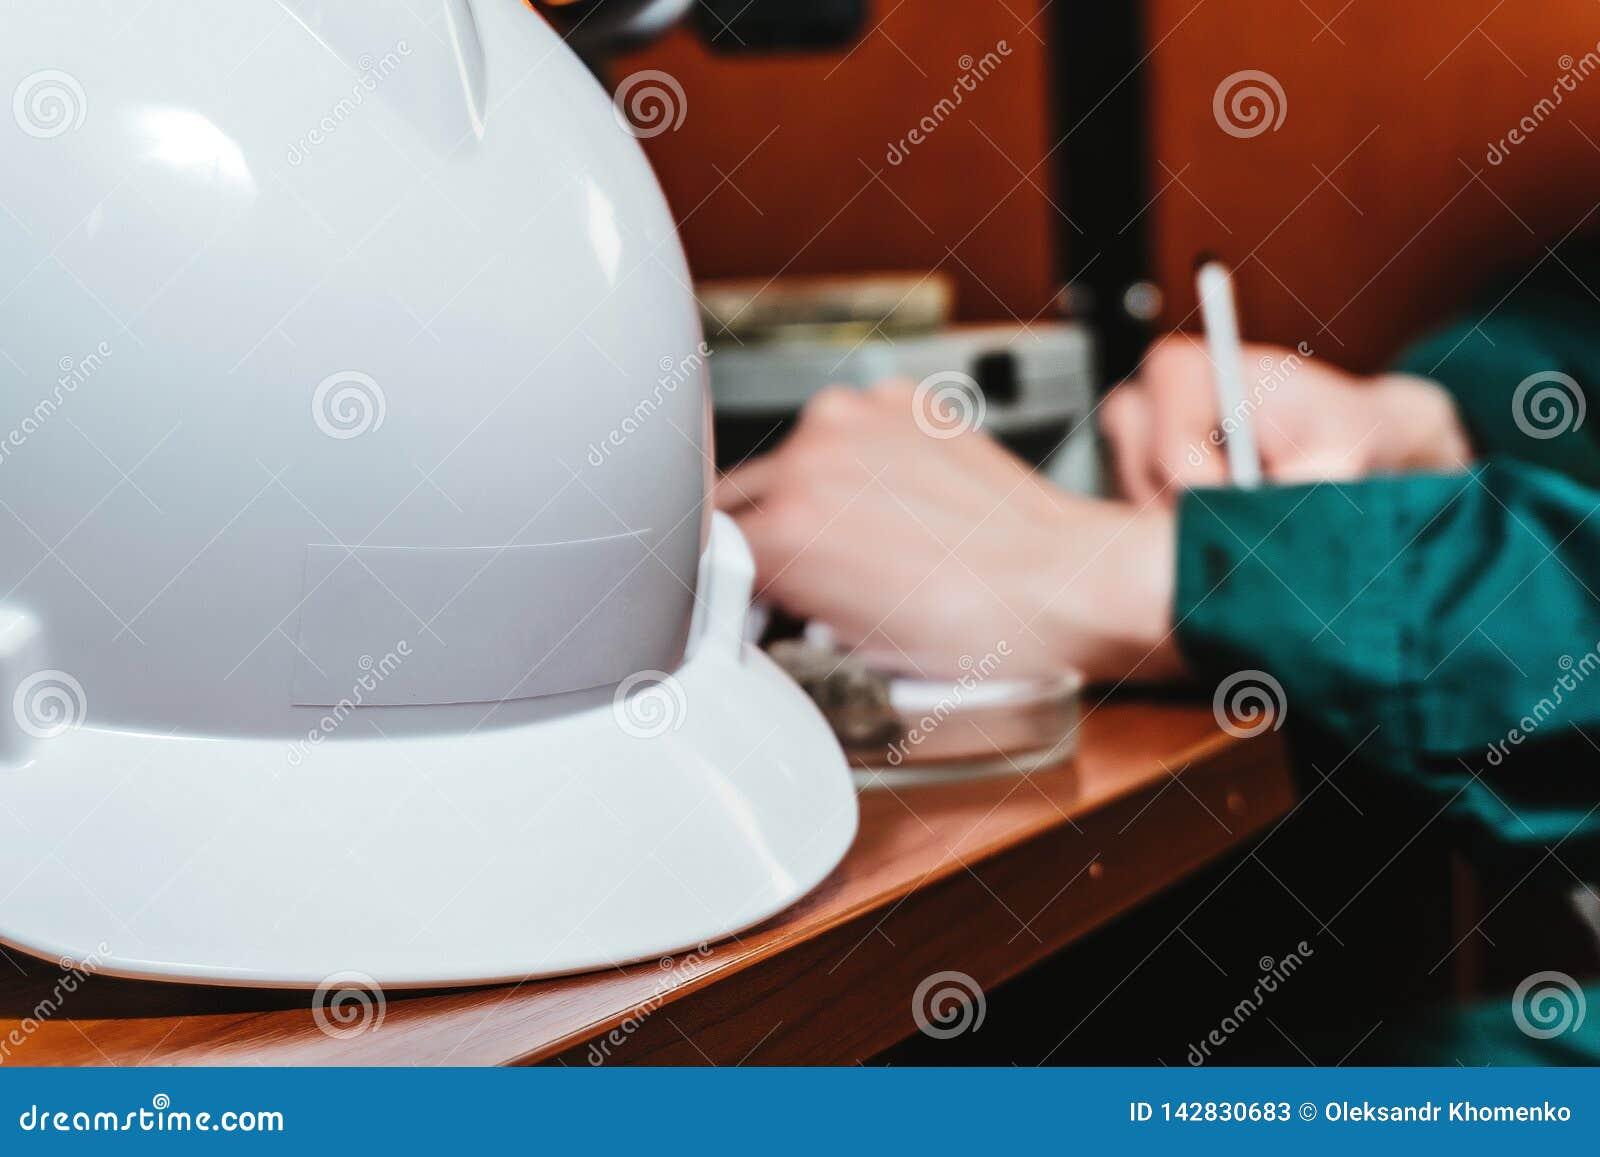 Protective helmet hands write something